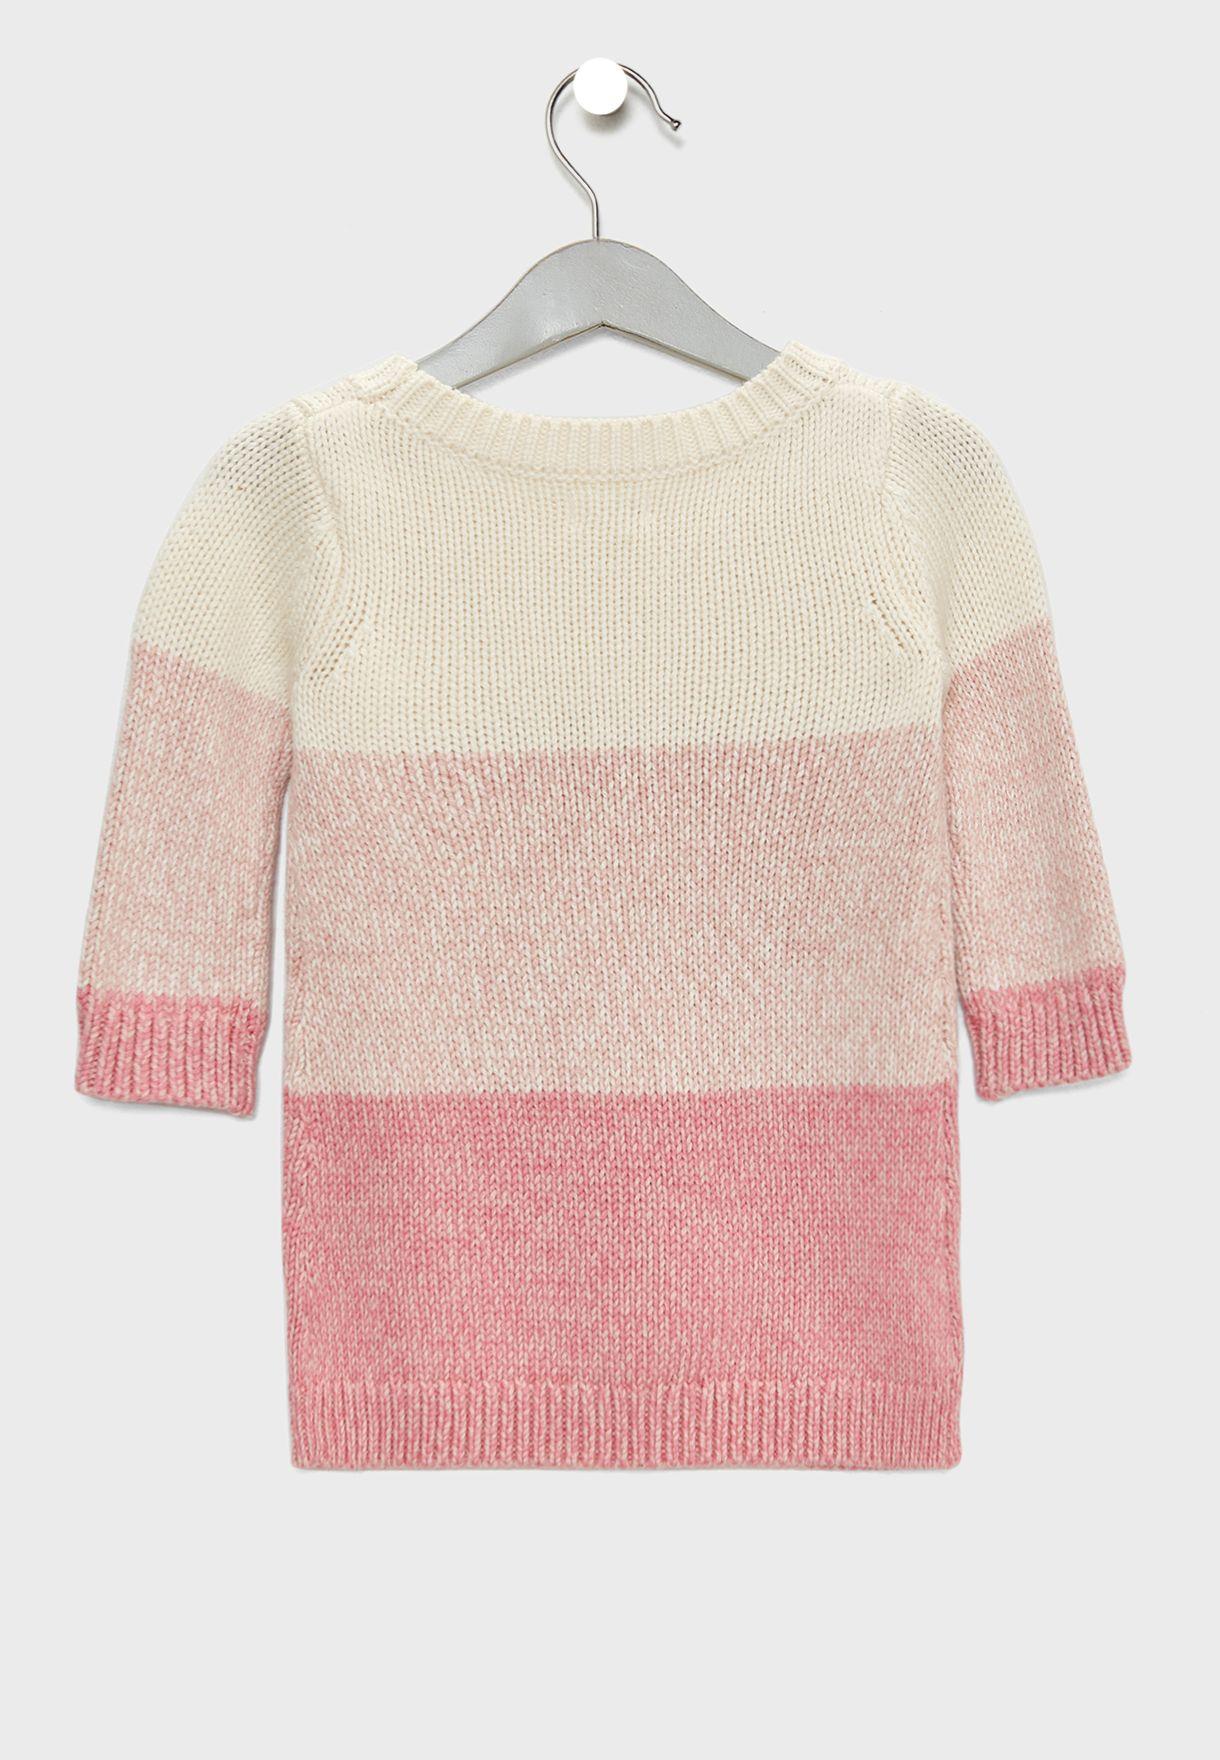 Girls' Clothing (newborn-5t) Gymboree Sweater Dress 18-24m